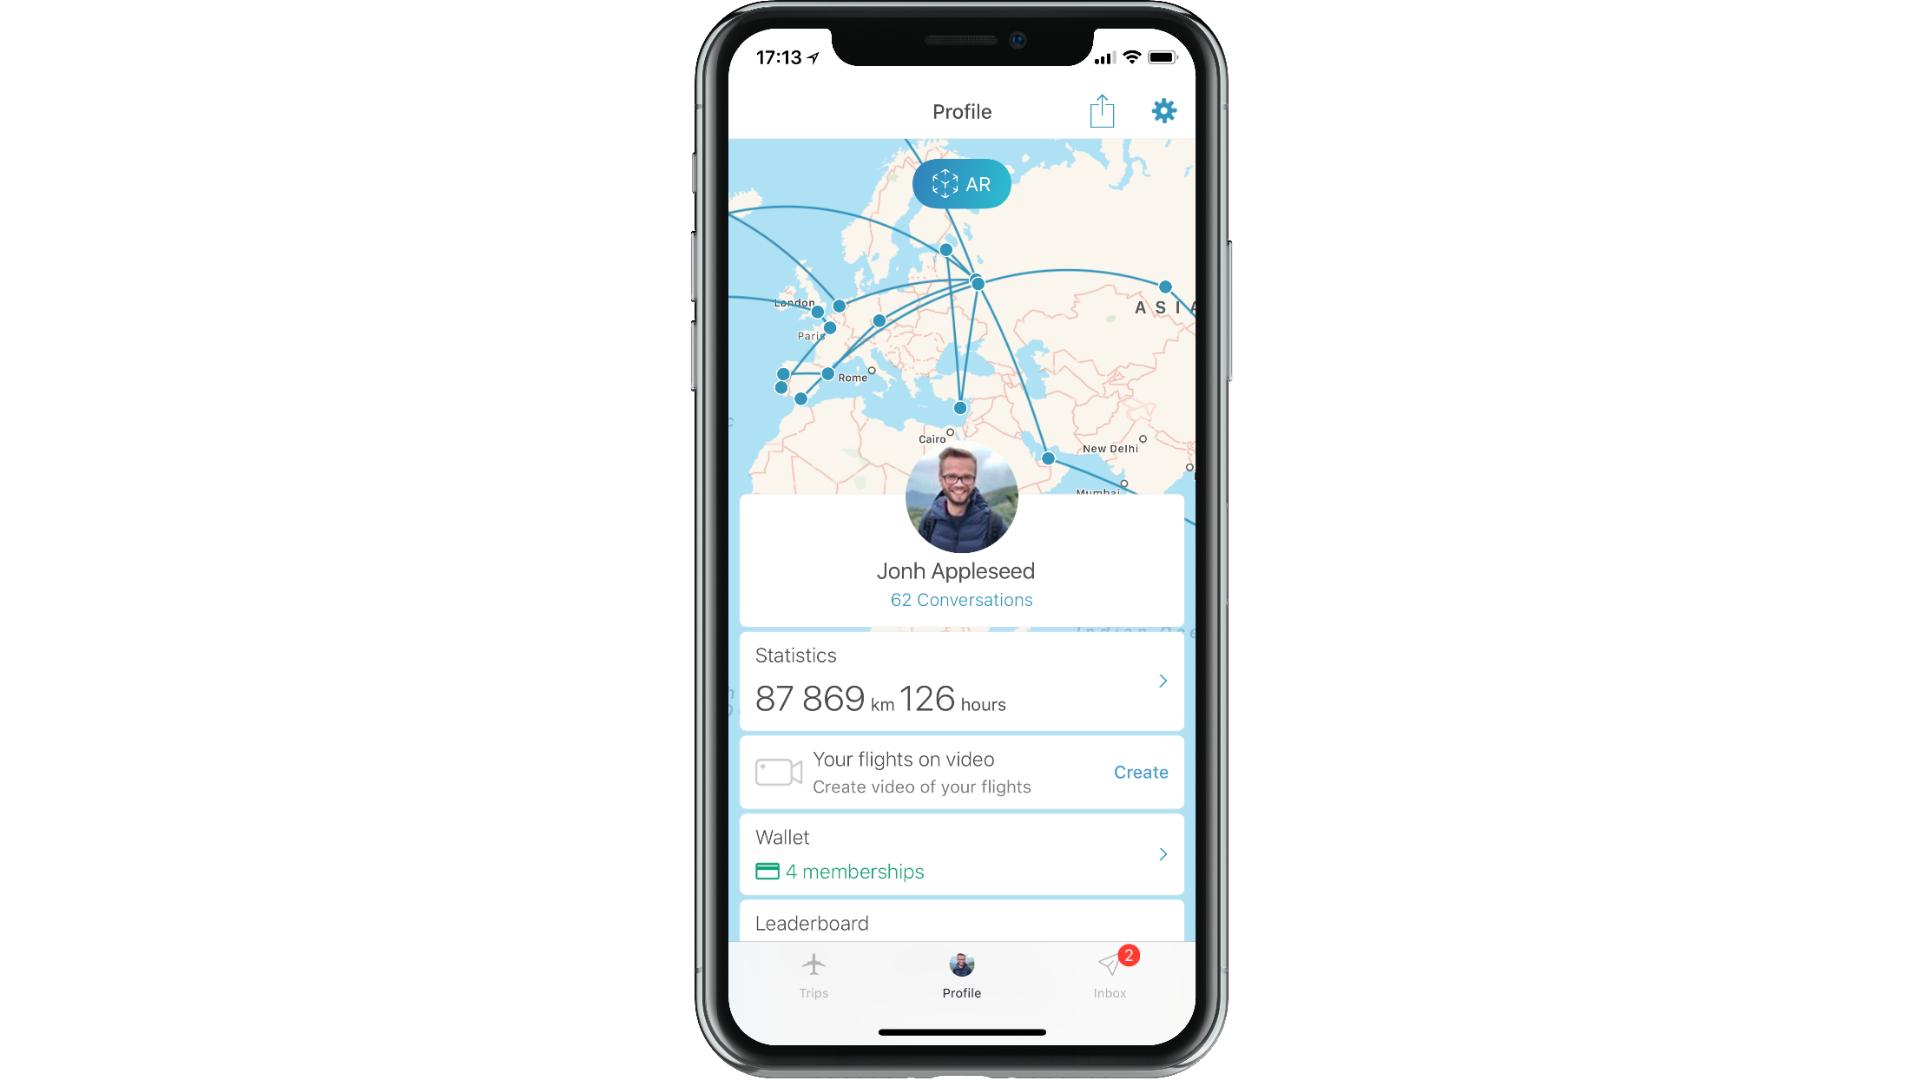 Как реализуется Retentioneering в App in the Air - 1